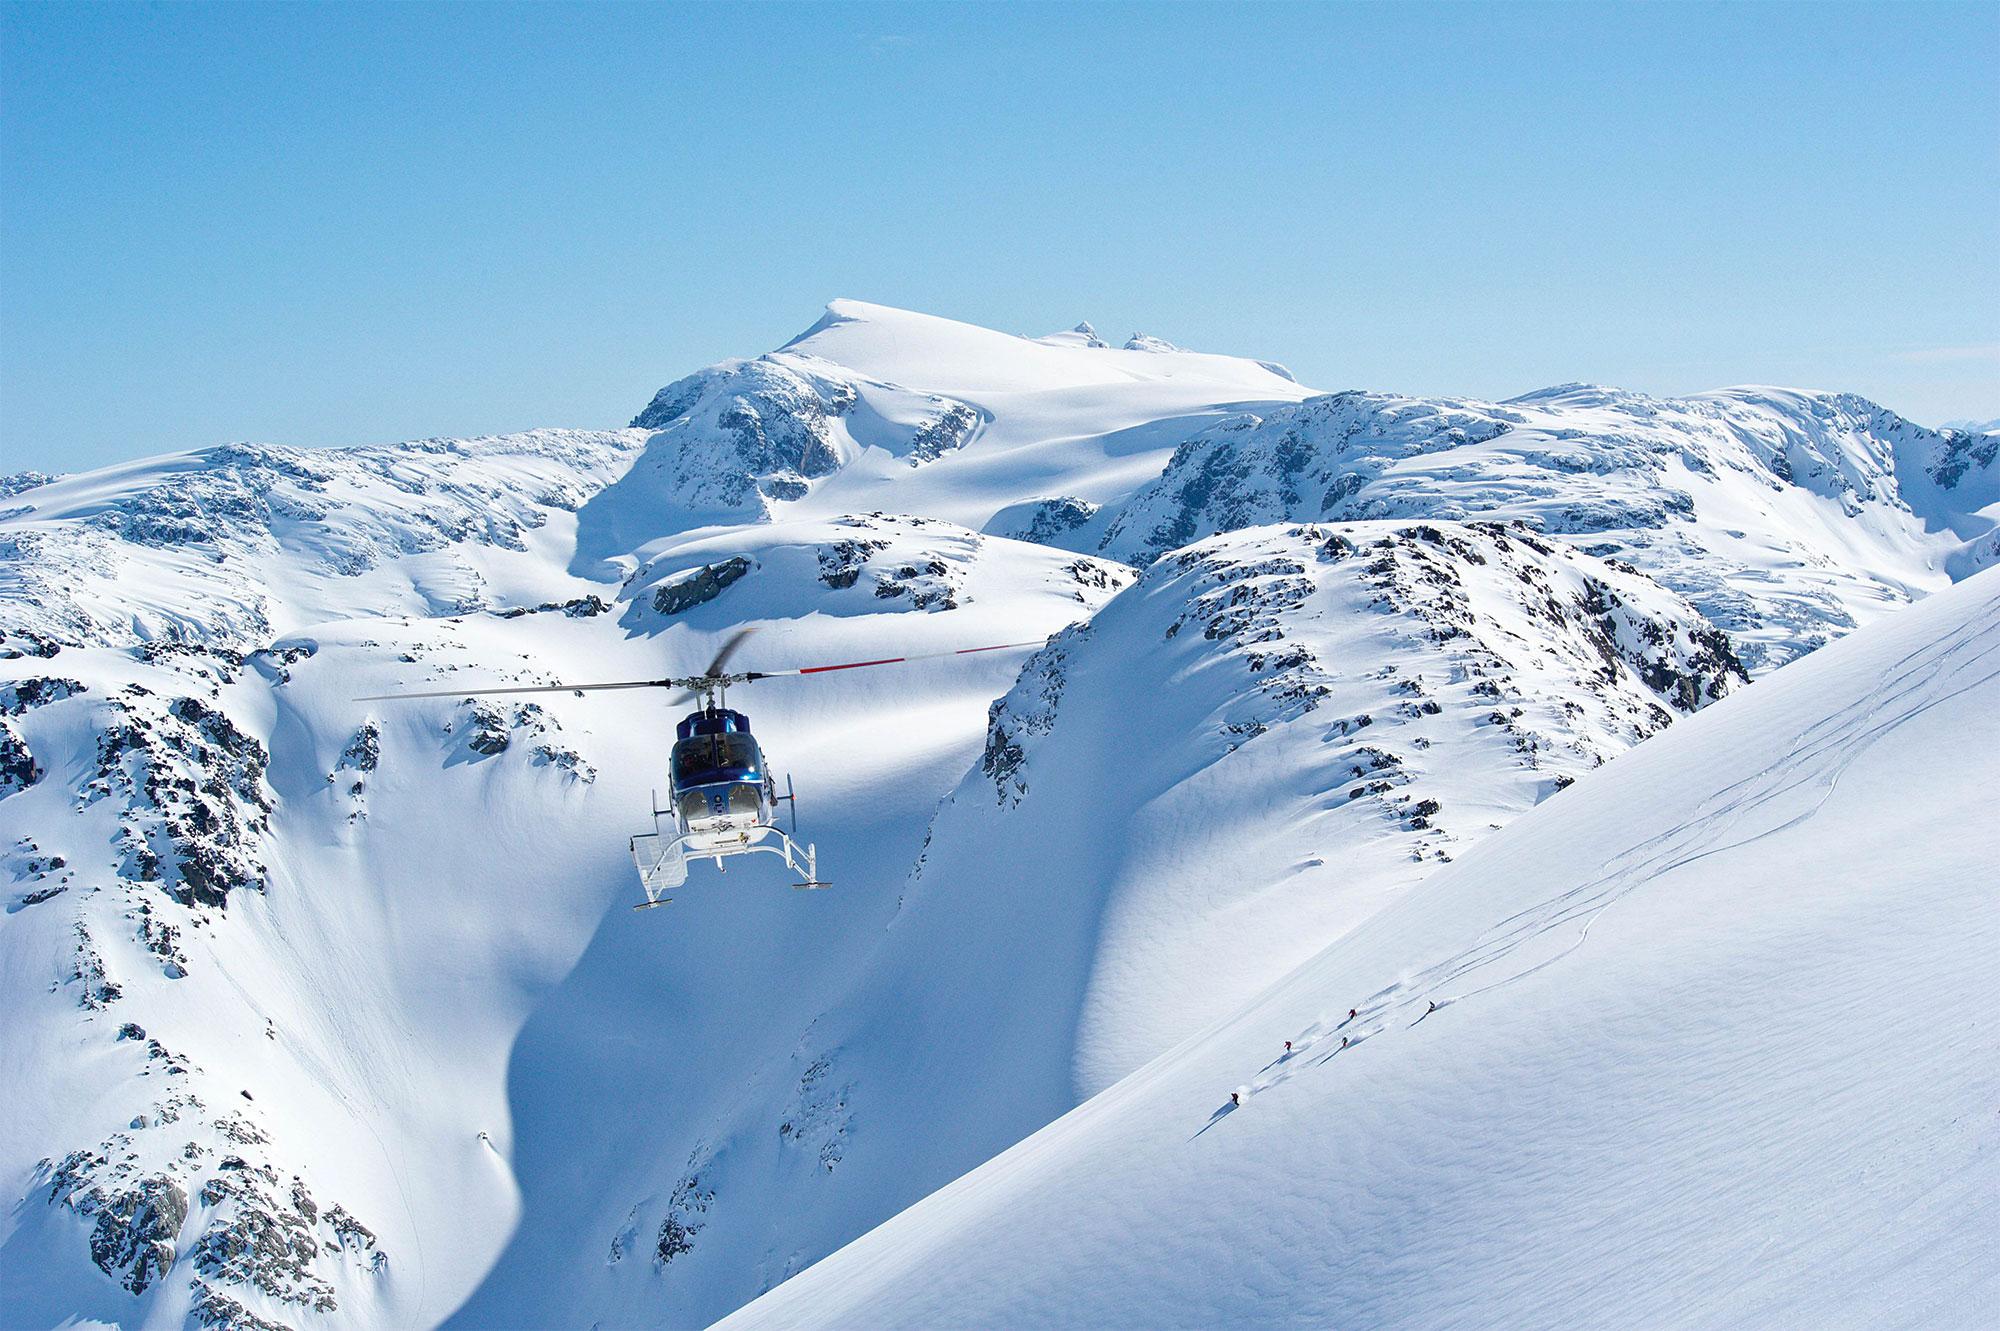 heli ski whistler with Ski Whistler Canada Multi Activites on Peak To Peak Gondola likewise Whistler Mountain Biking moreover Third Adventure Travel Heli Ski In Canada also Hotels additionally Carleton Lodge 408.